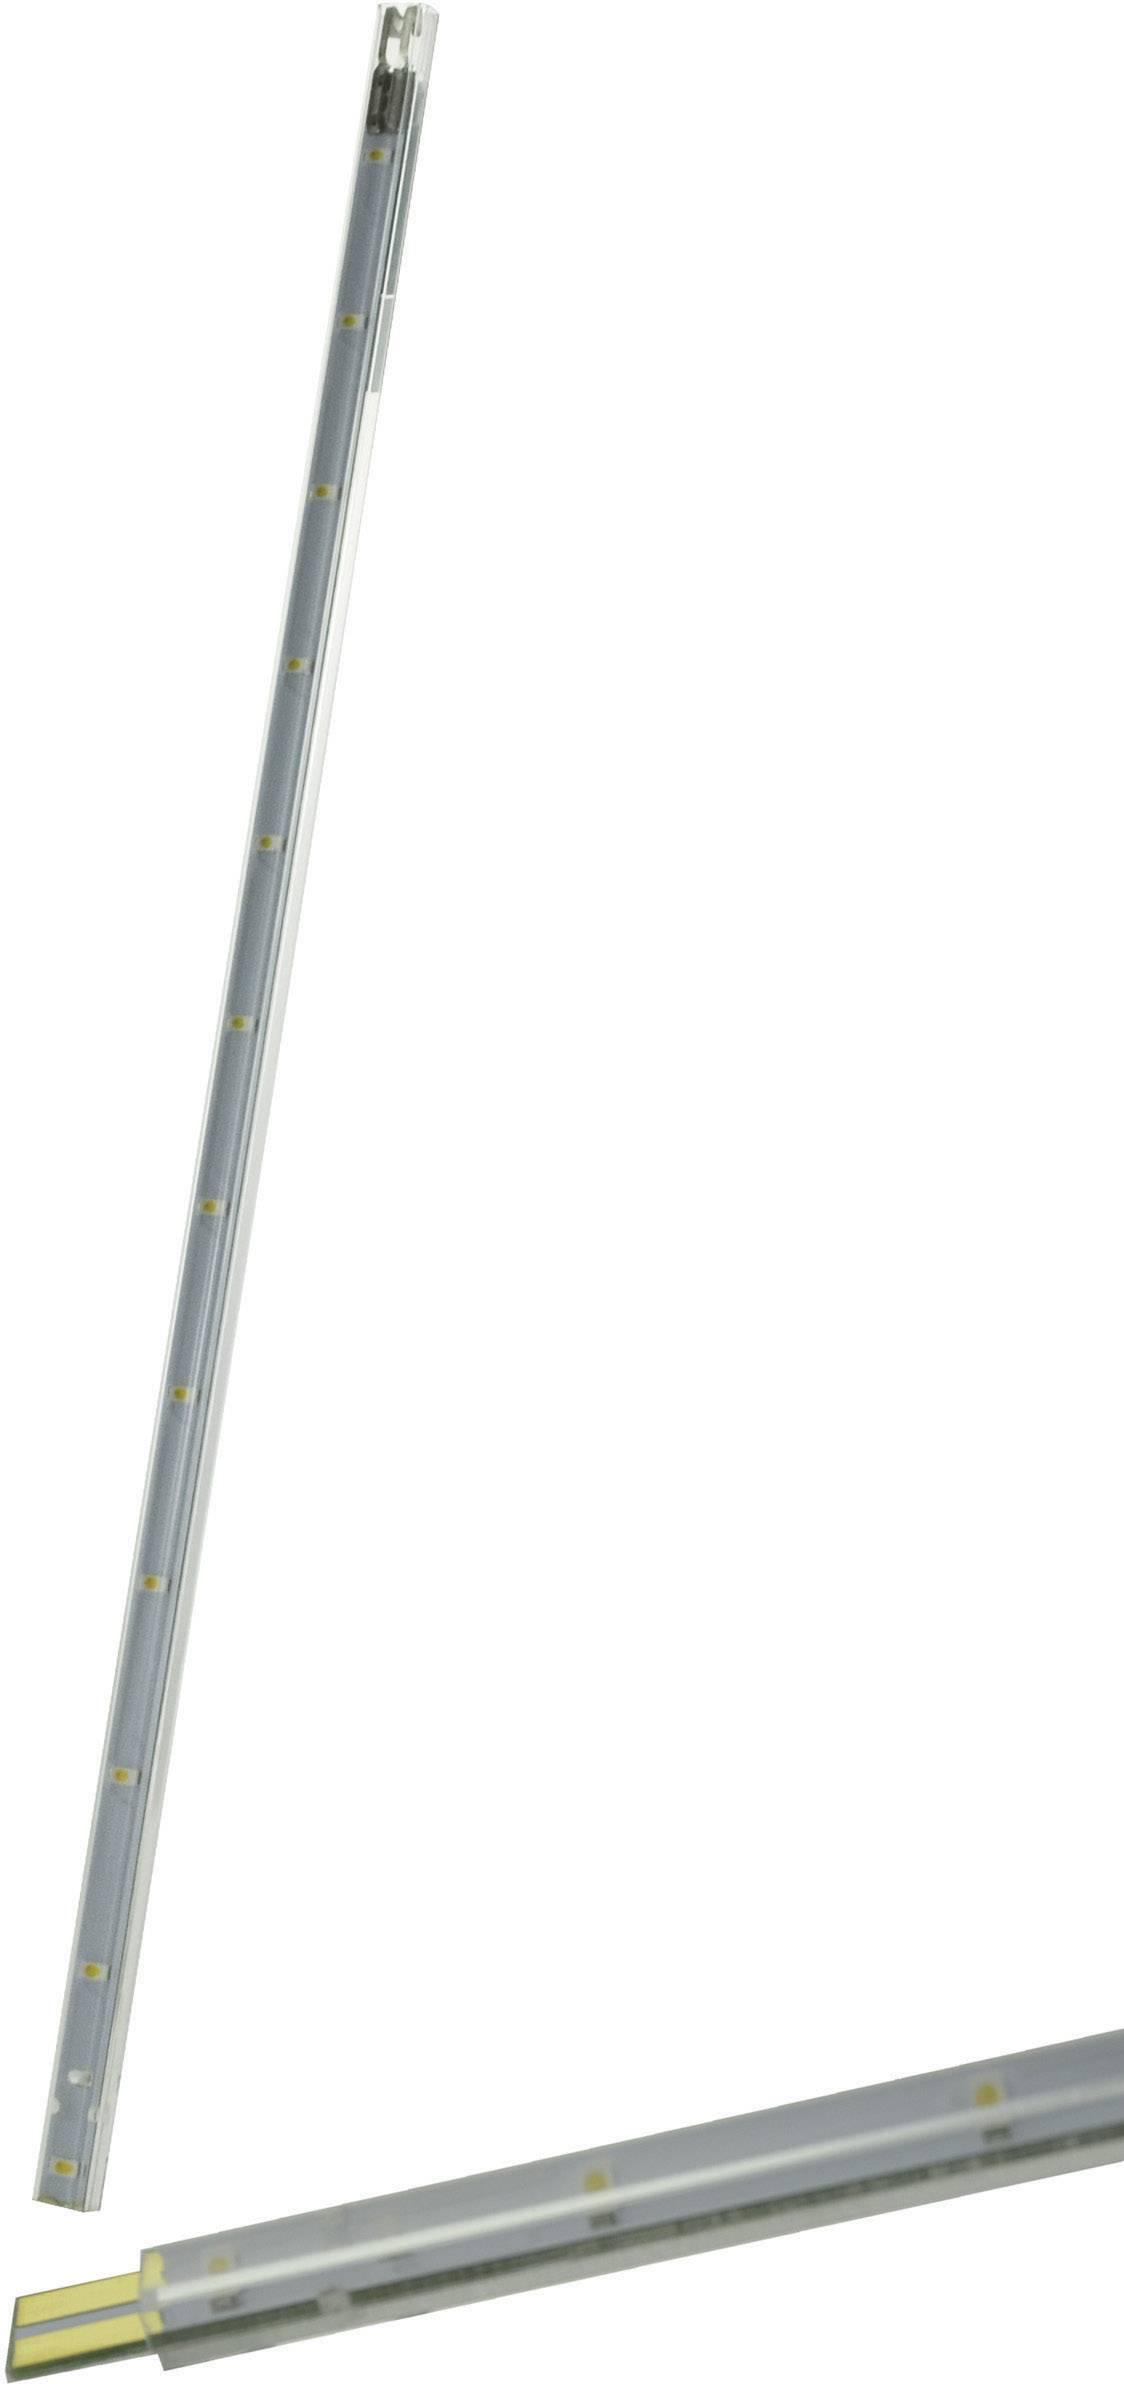 Dekorační LED lišta Rolux, 12x LED, 30 cm, studená bílá (30083113130)